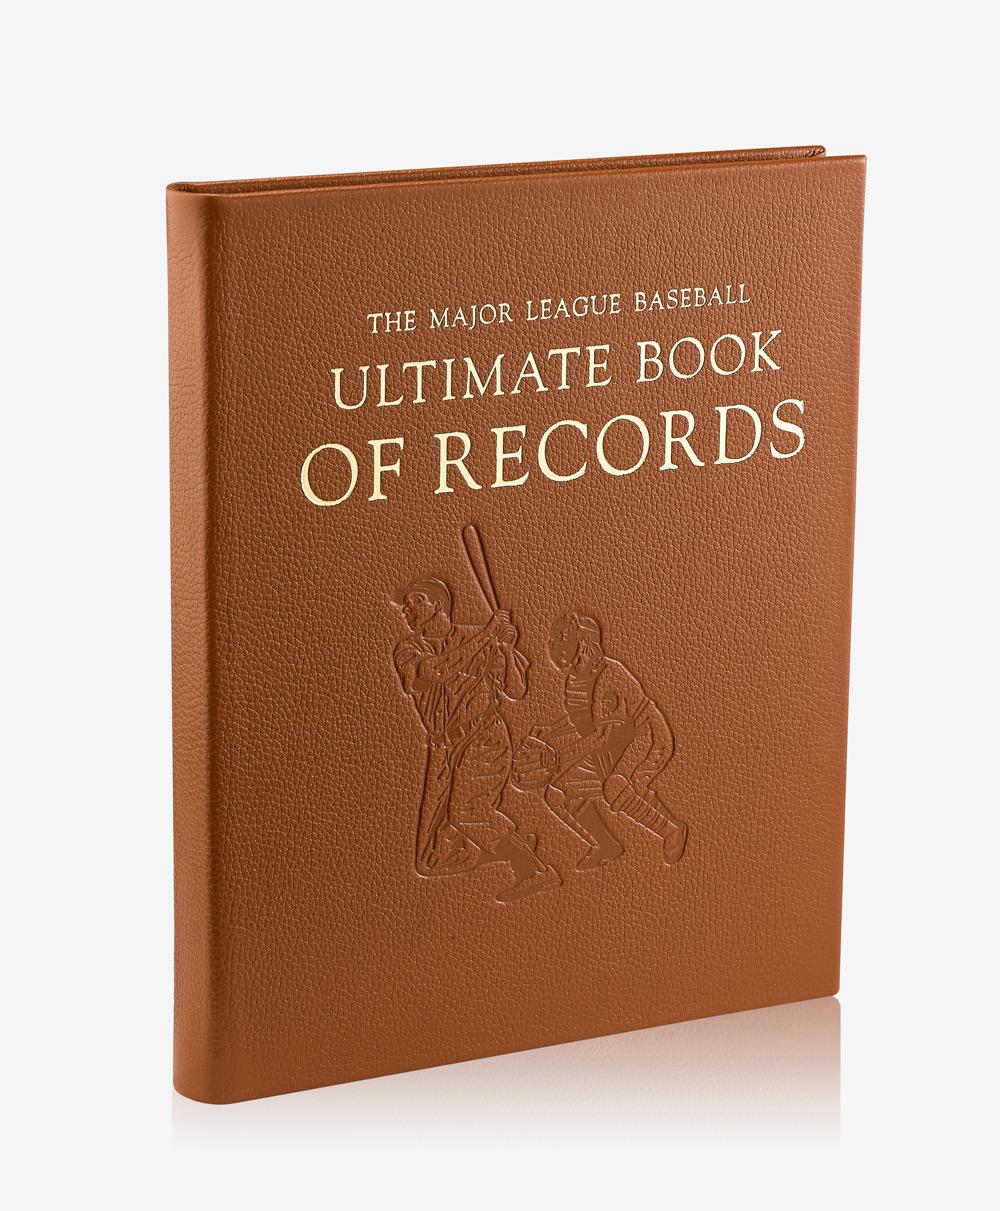 The Major League Baseball Ultimate Book of Records Full Grain Leather BSB-BULT-FLO-SDL